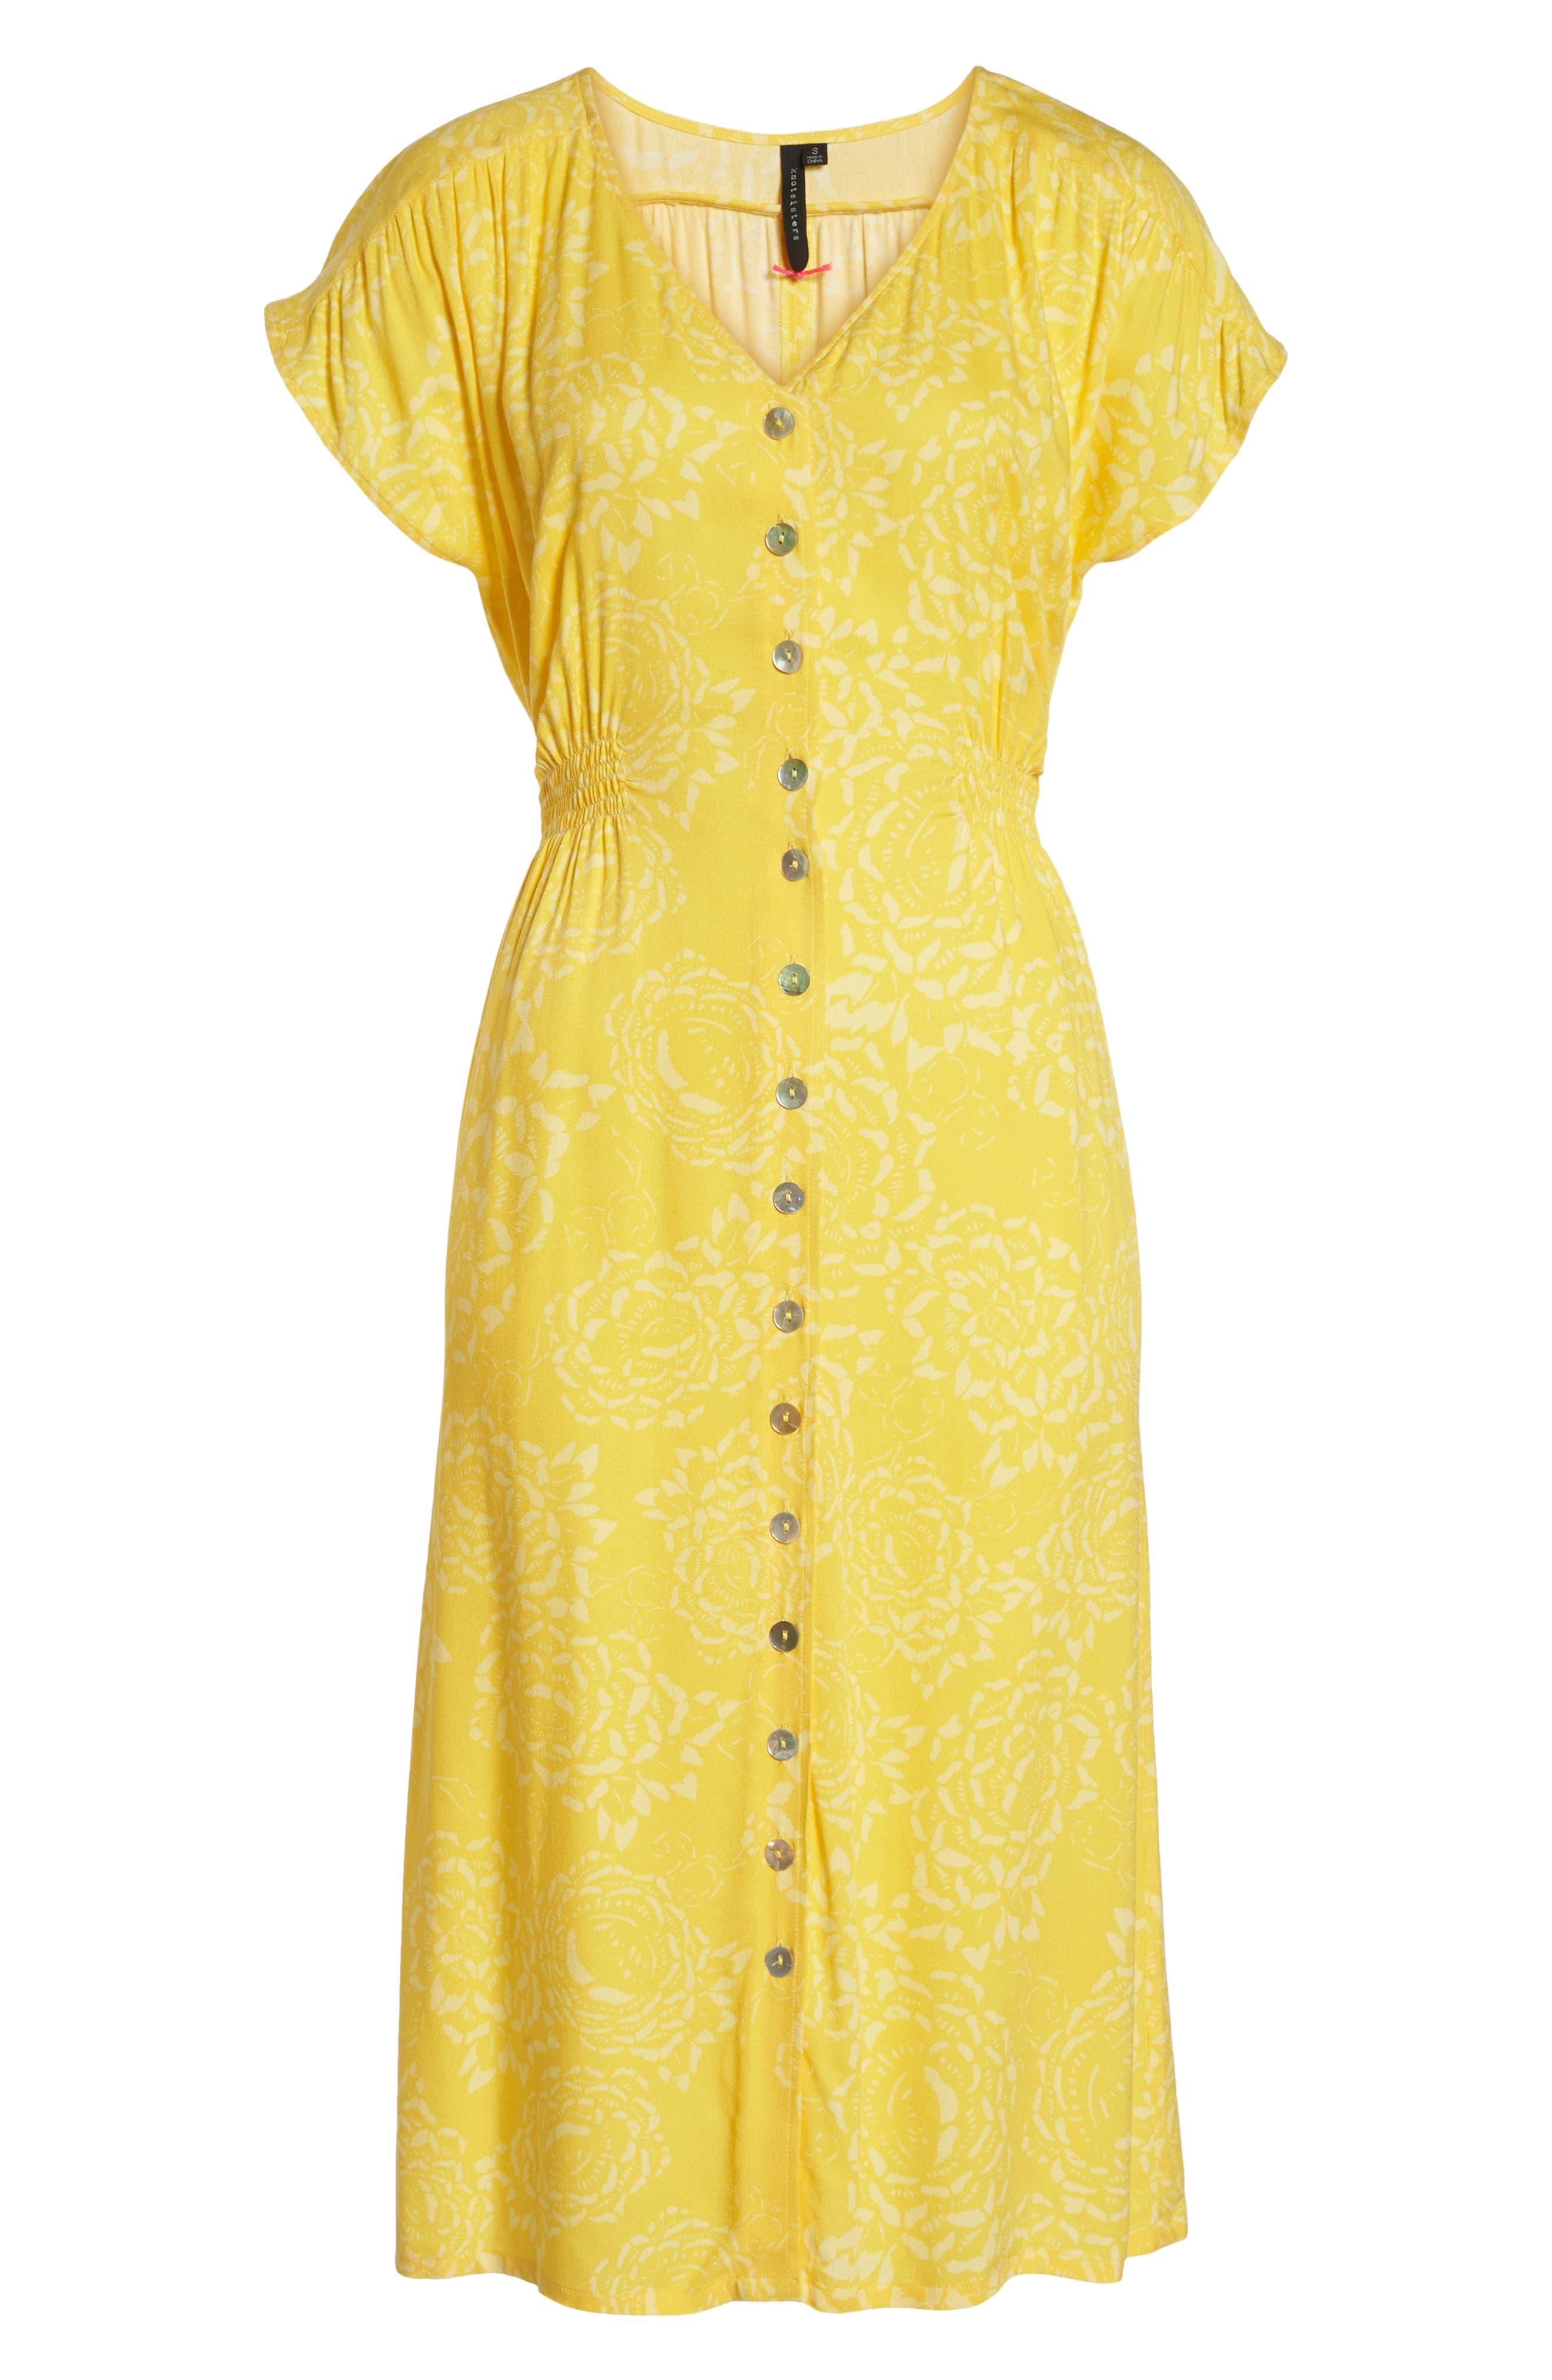 Lido Front Button Sheath Dress,                             Alternate thumbnail 7, color,                             707